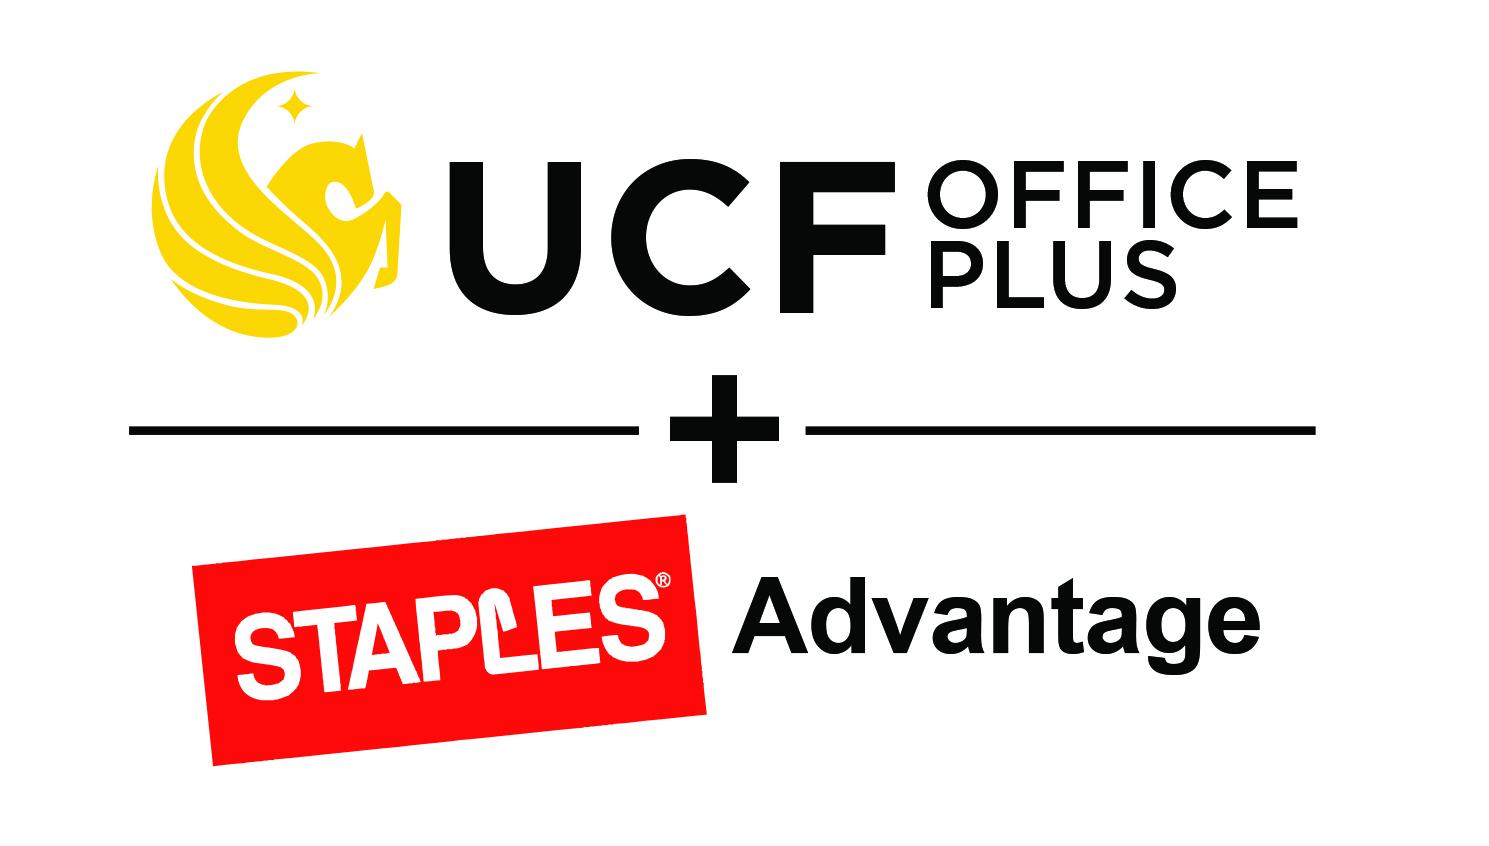 UCF Office Plus